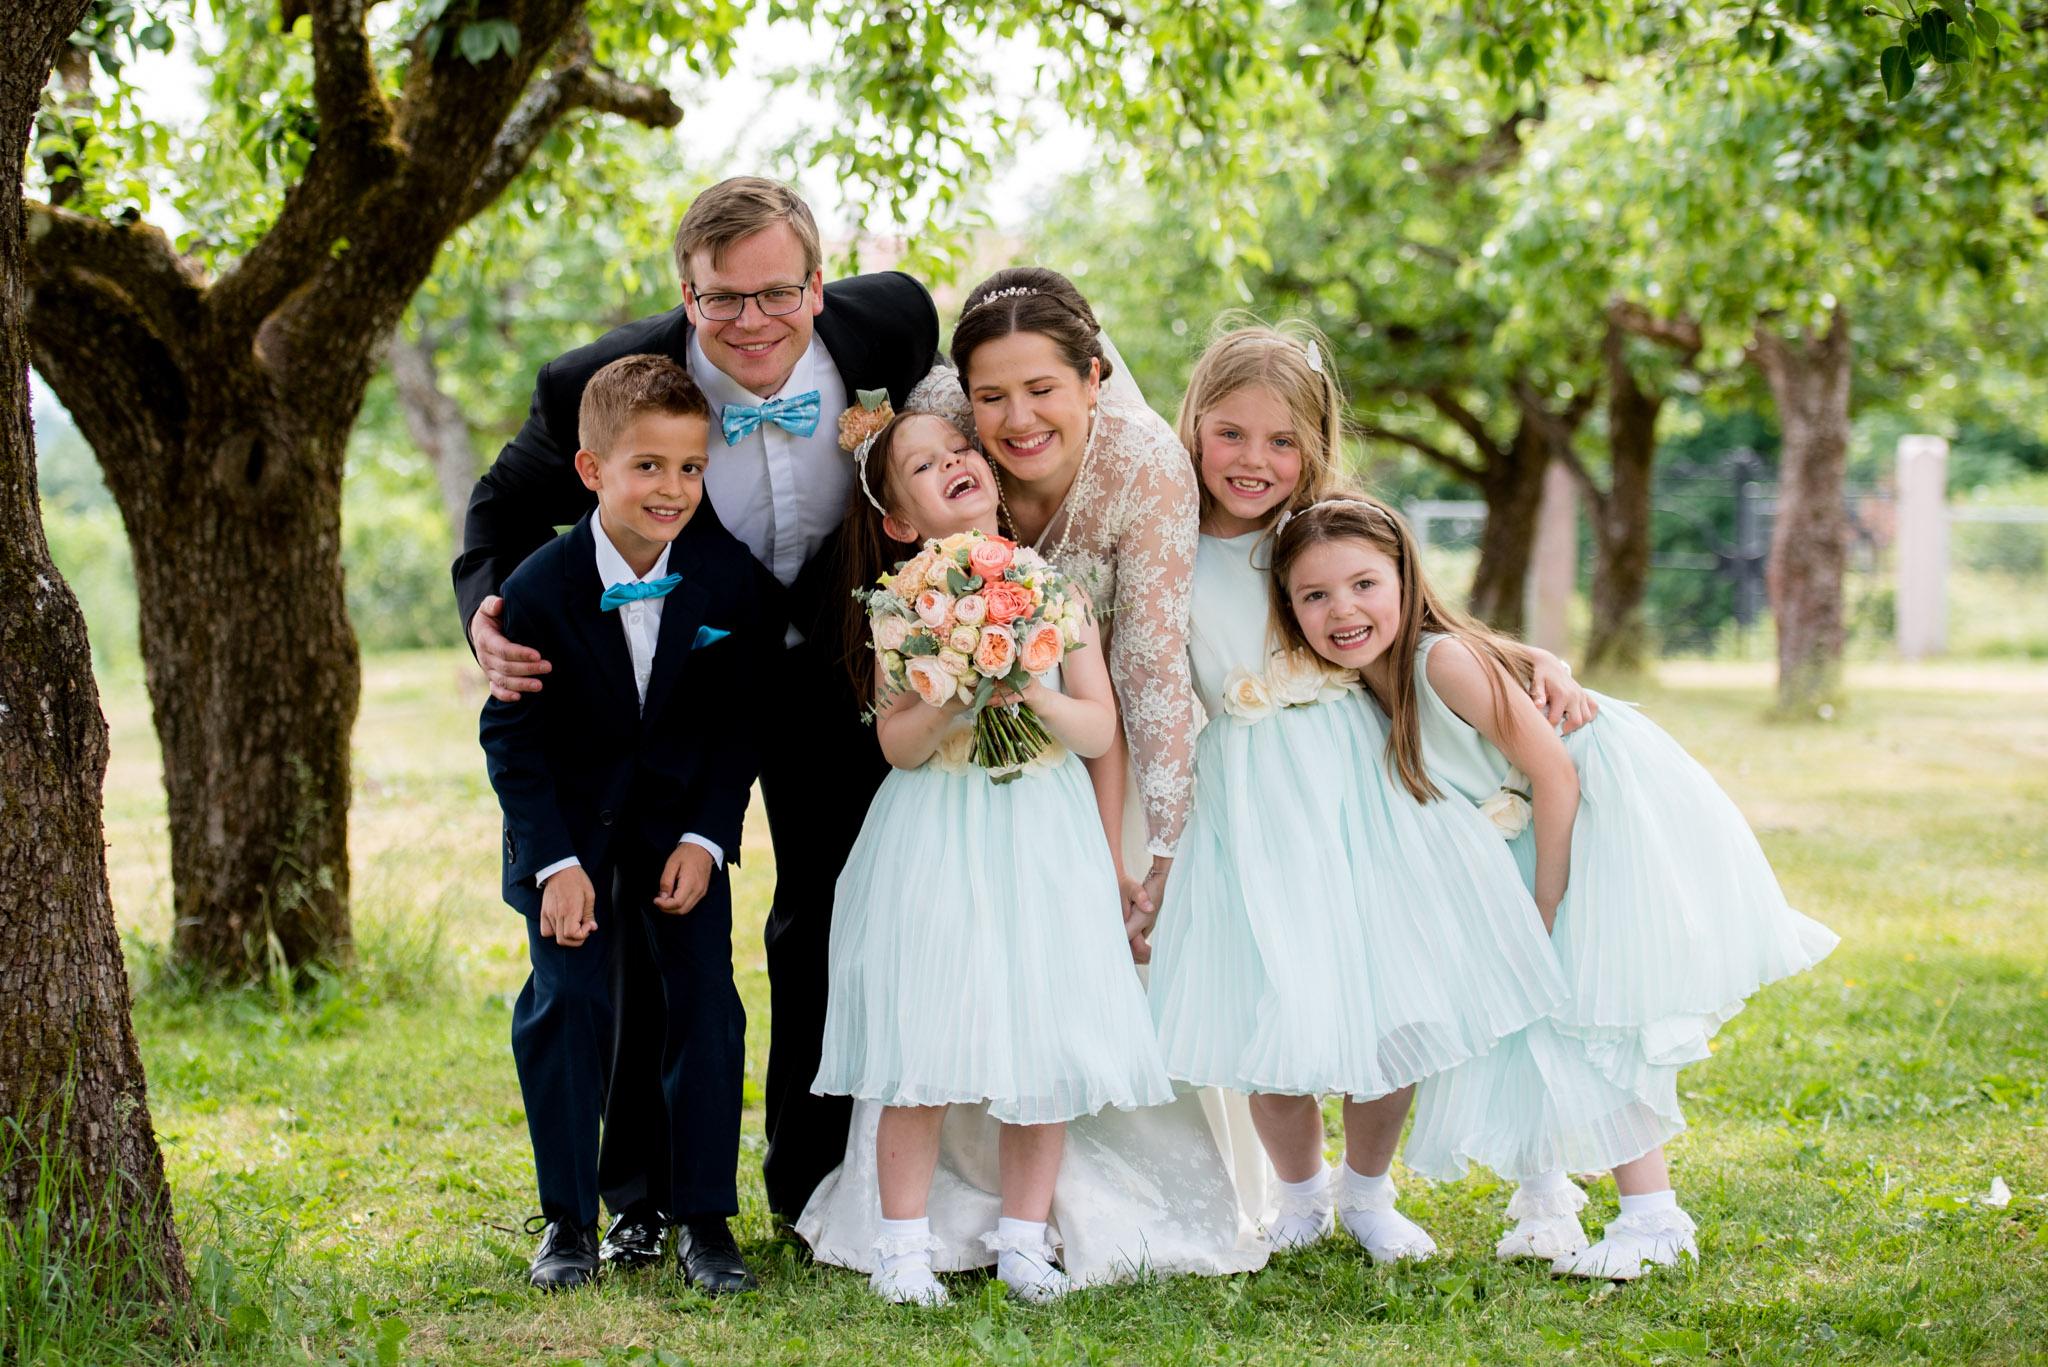 bryllupsfotograf-tønsberg-nøtterøy-fotograf-tjøme-vestfold-oslo-fotografvarpe--1005.JPG